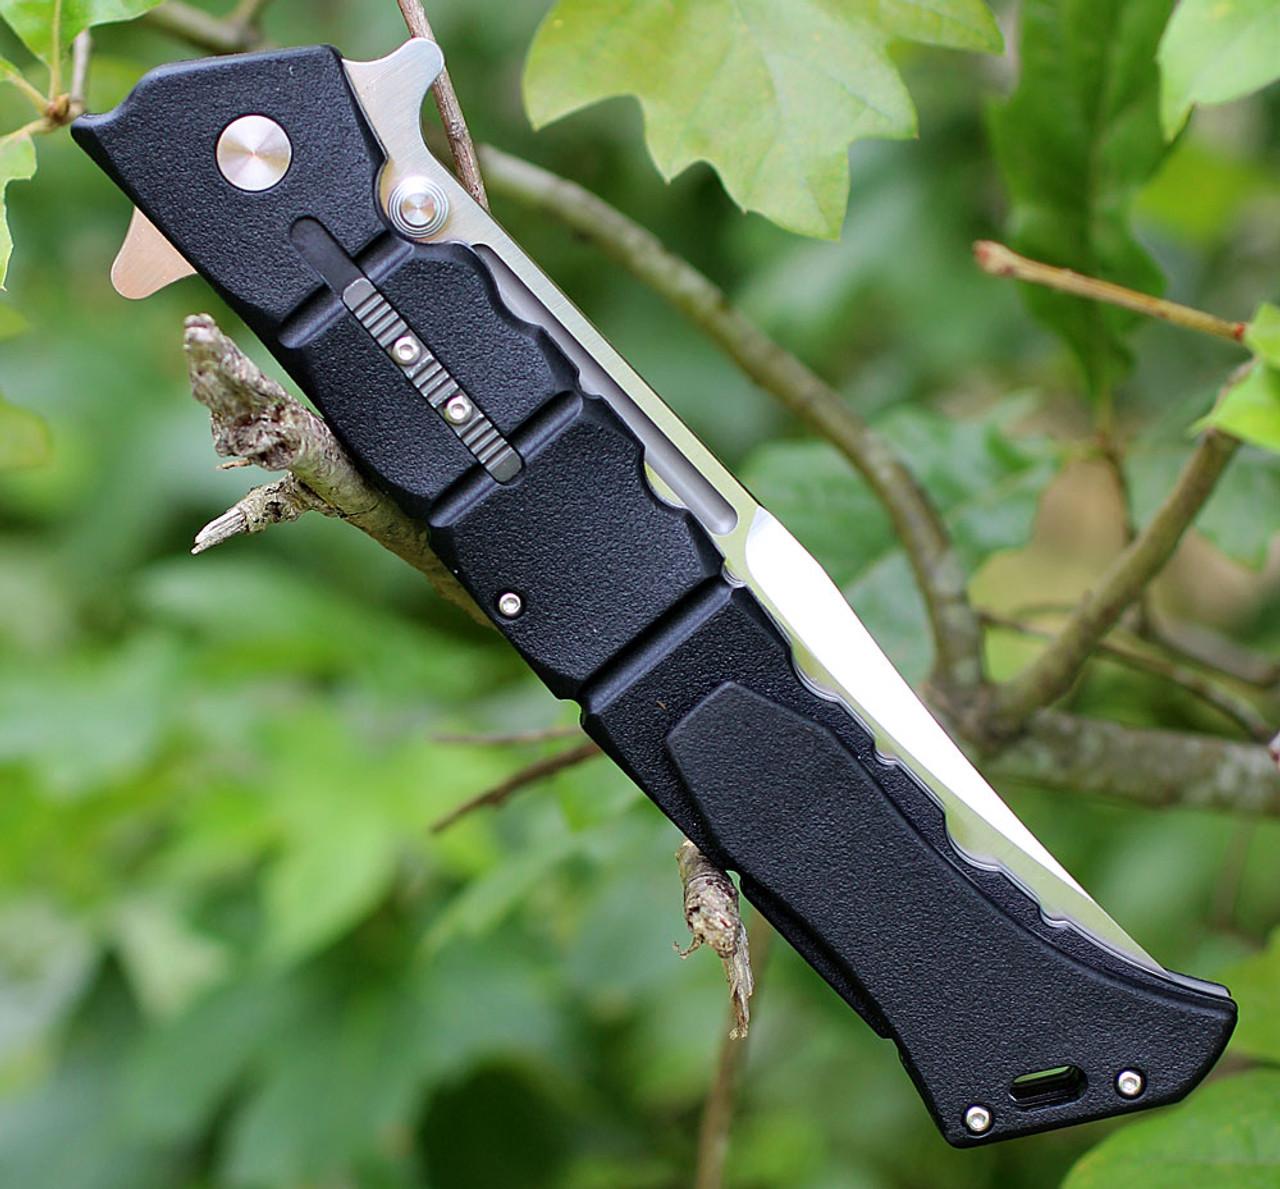 "Cold Steel 20NQX Large Luzon, 6"" 8Cr13MoV Plain Blade, Black GFN Handle"